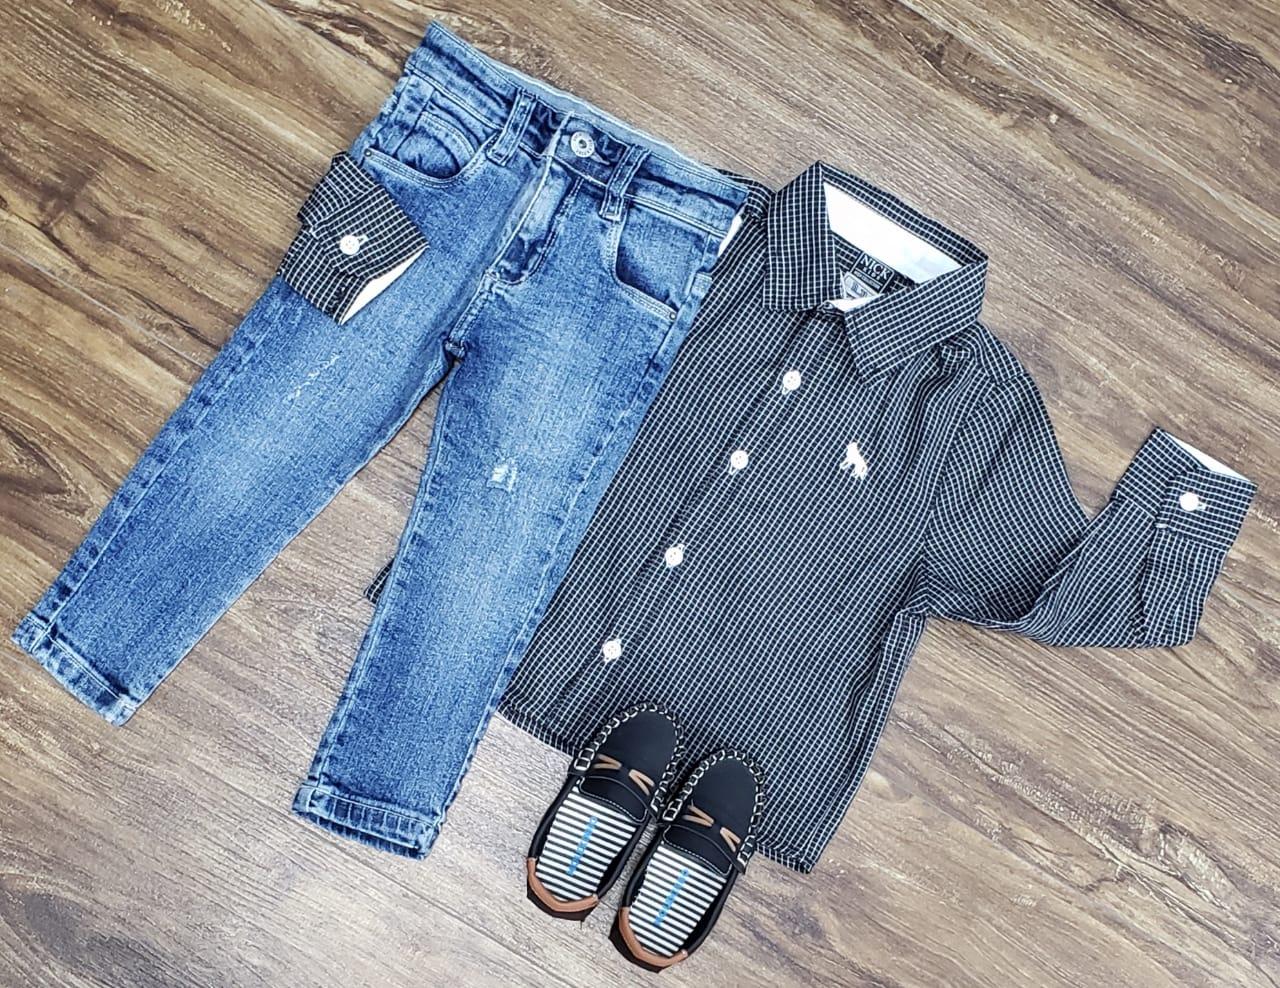 Calça Jeans com Camisa Cinza Manga Longa